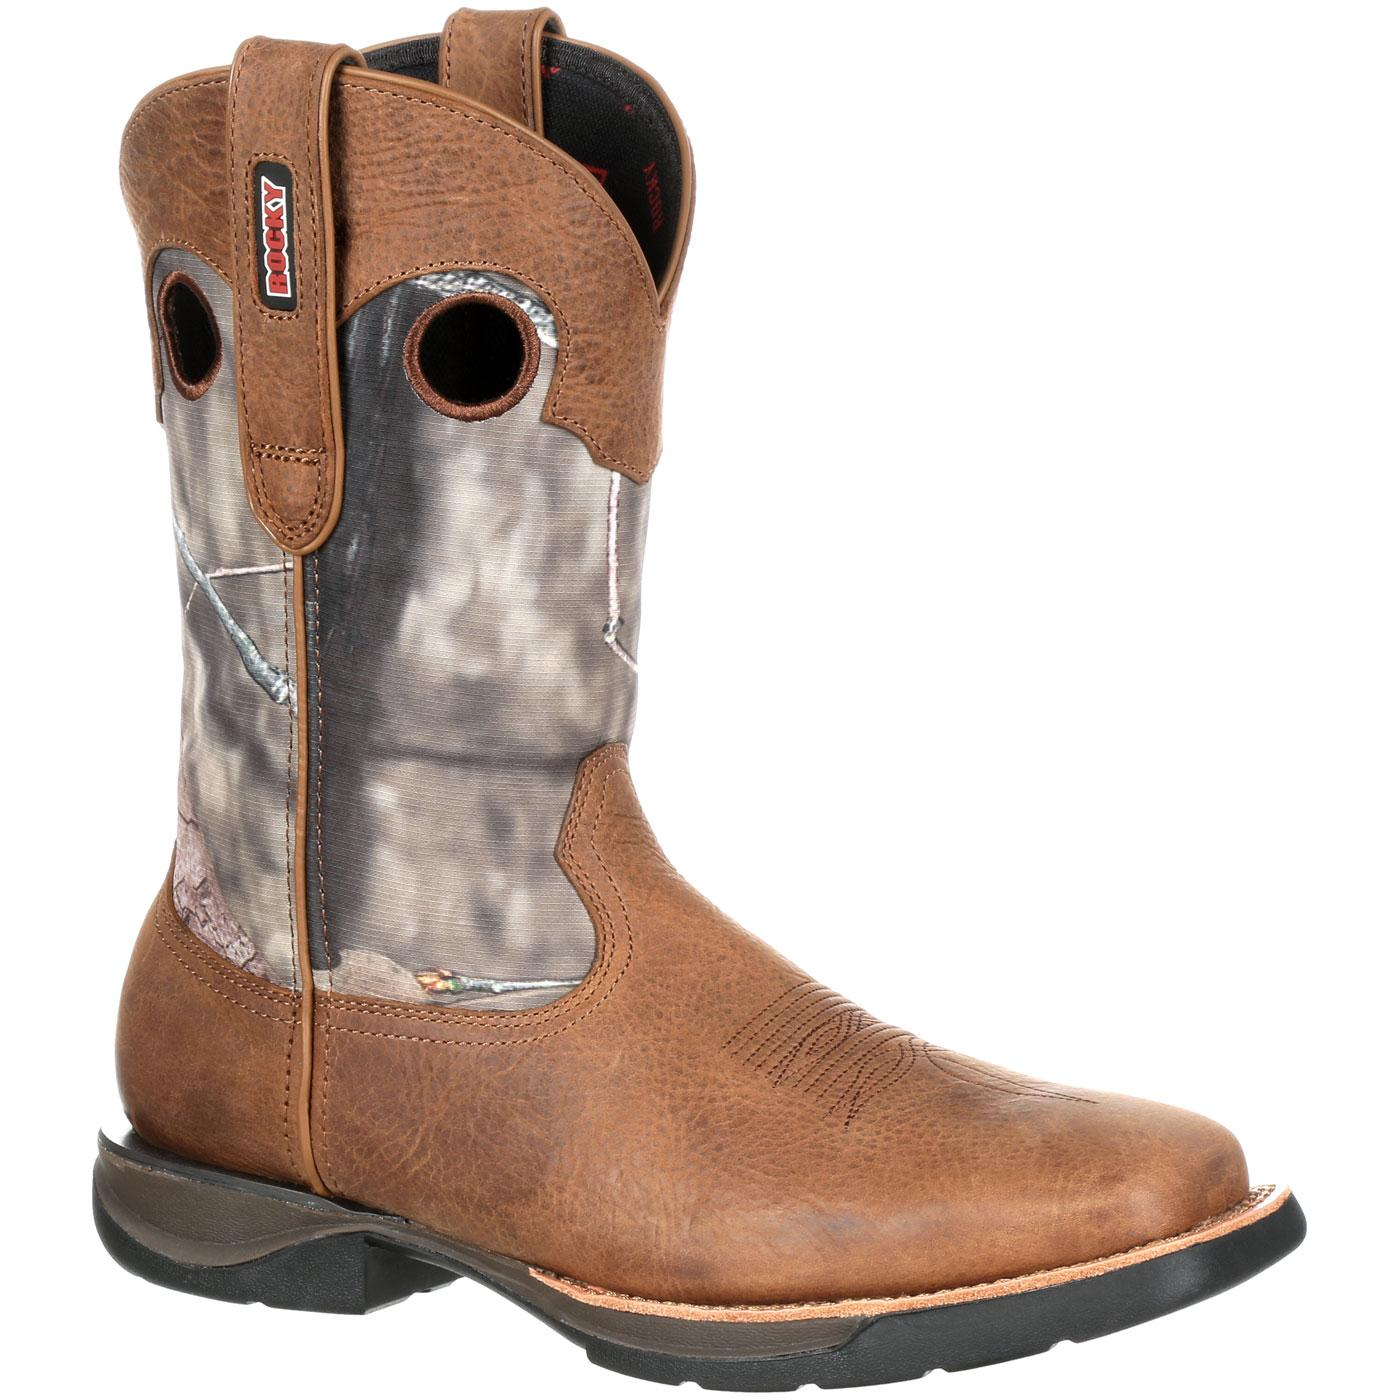 Rocky LT: Men's Lightweight Waterproof Camo Western Boots